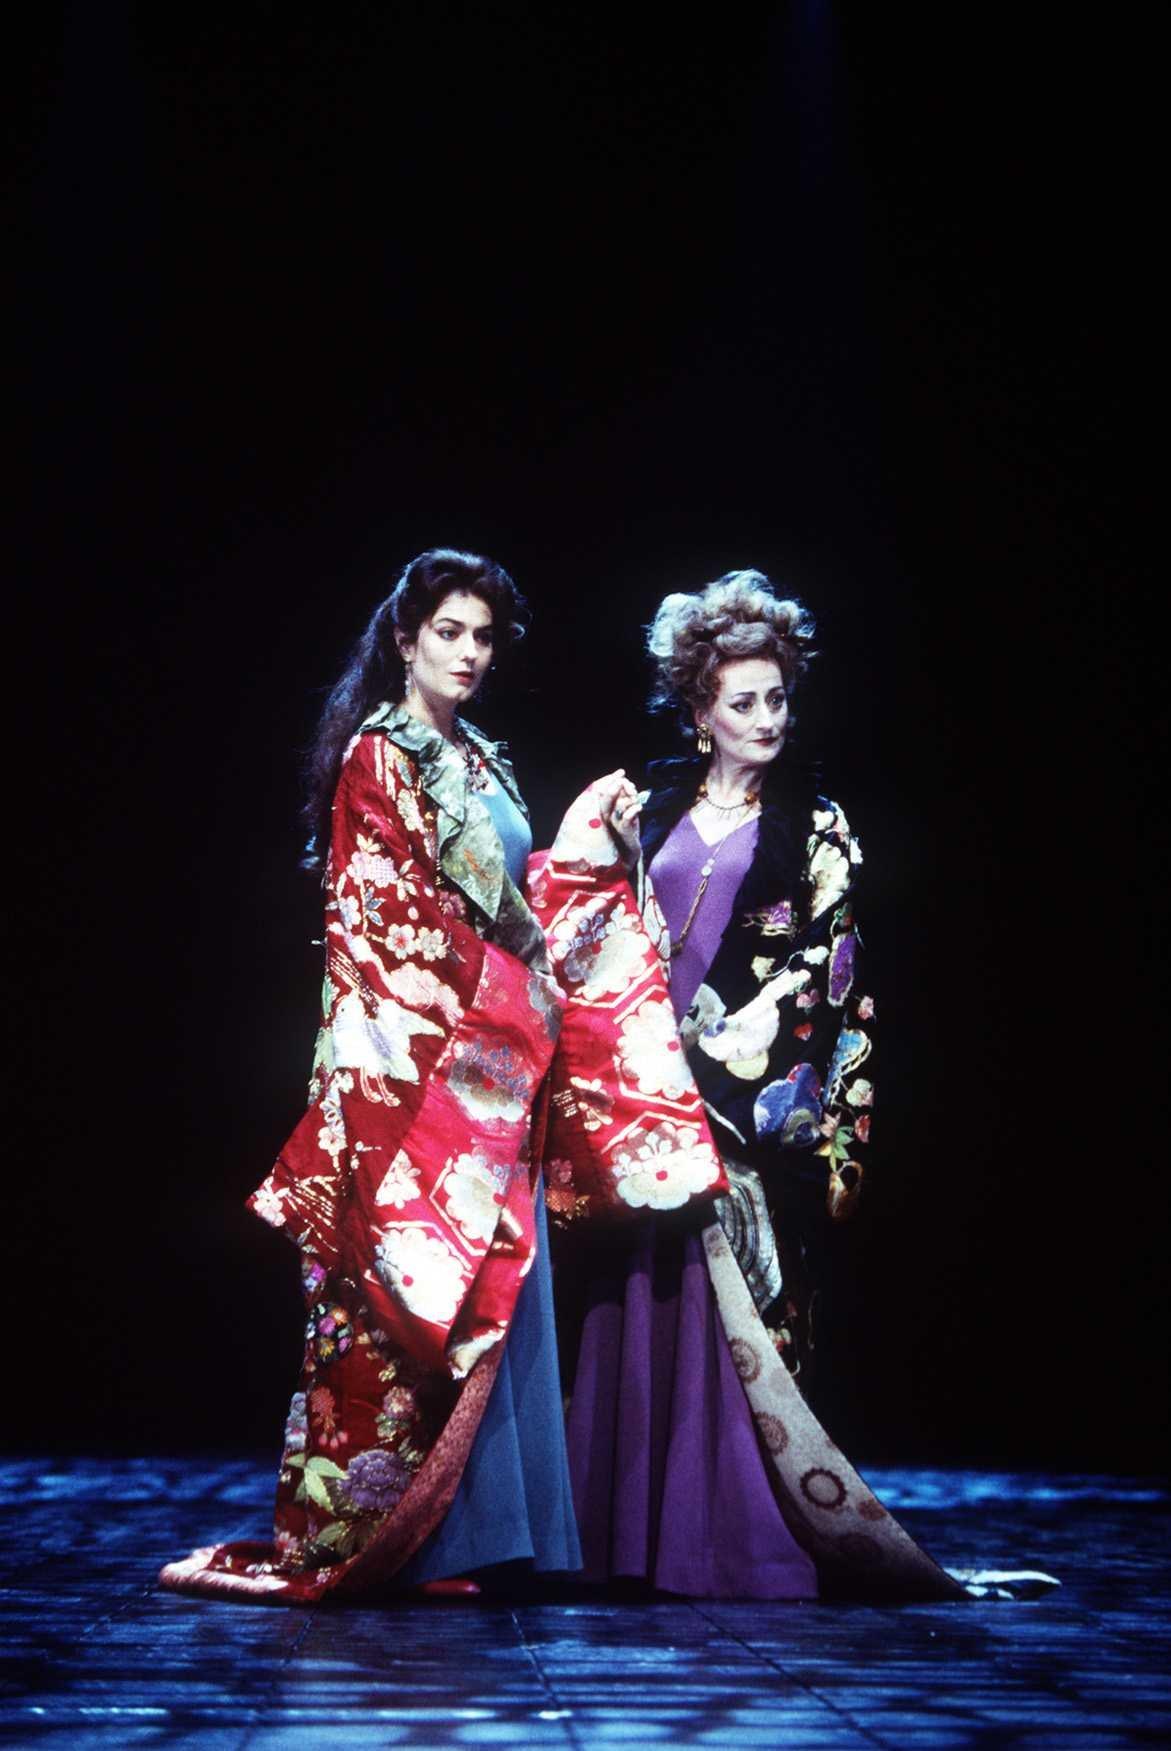 Regan and Goneril in oriental-style kimonos.